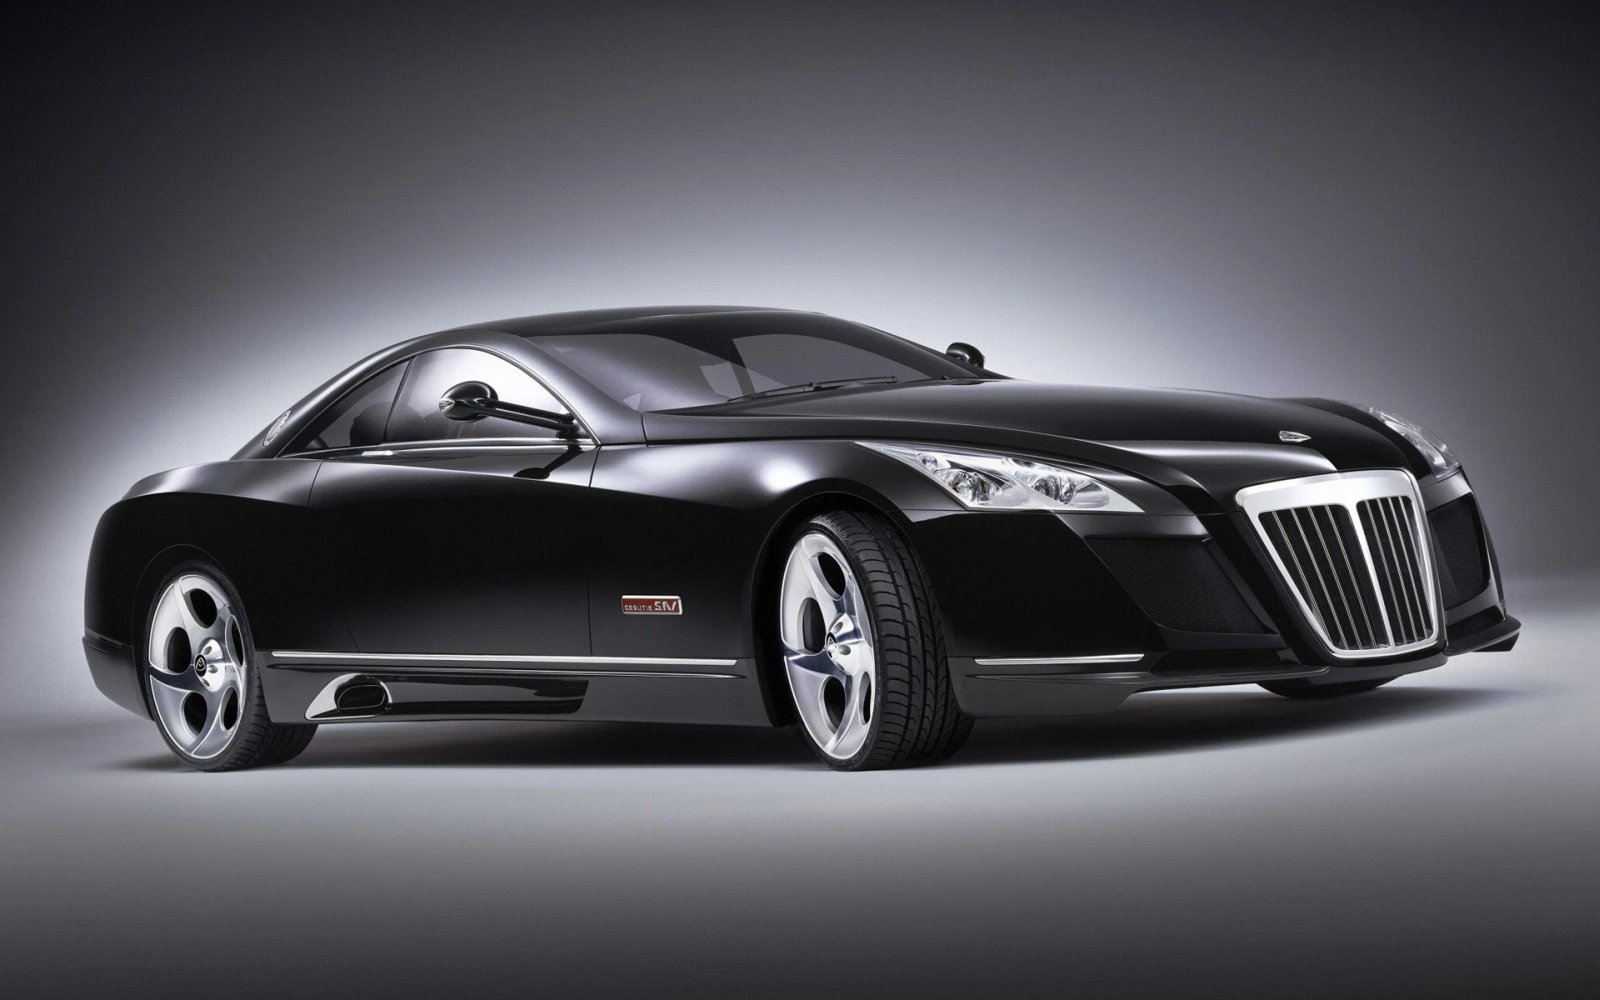 neues maybach coupé angeteasert - alles auto